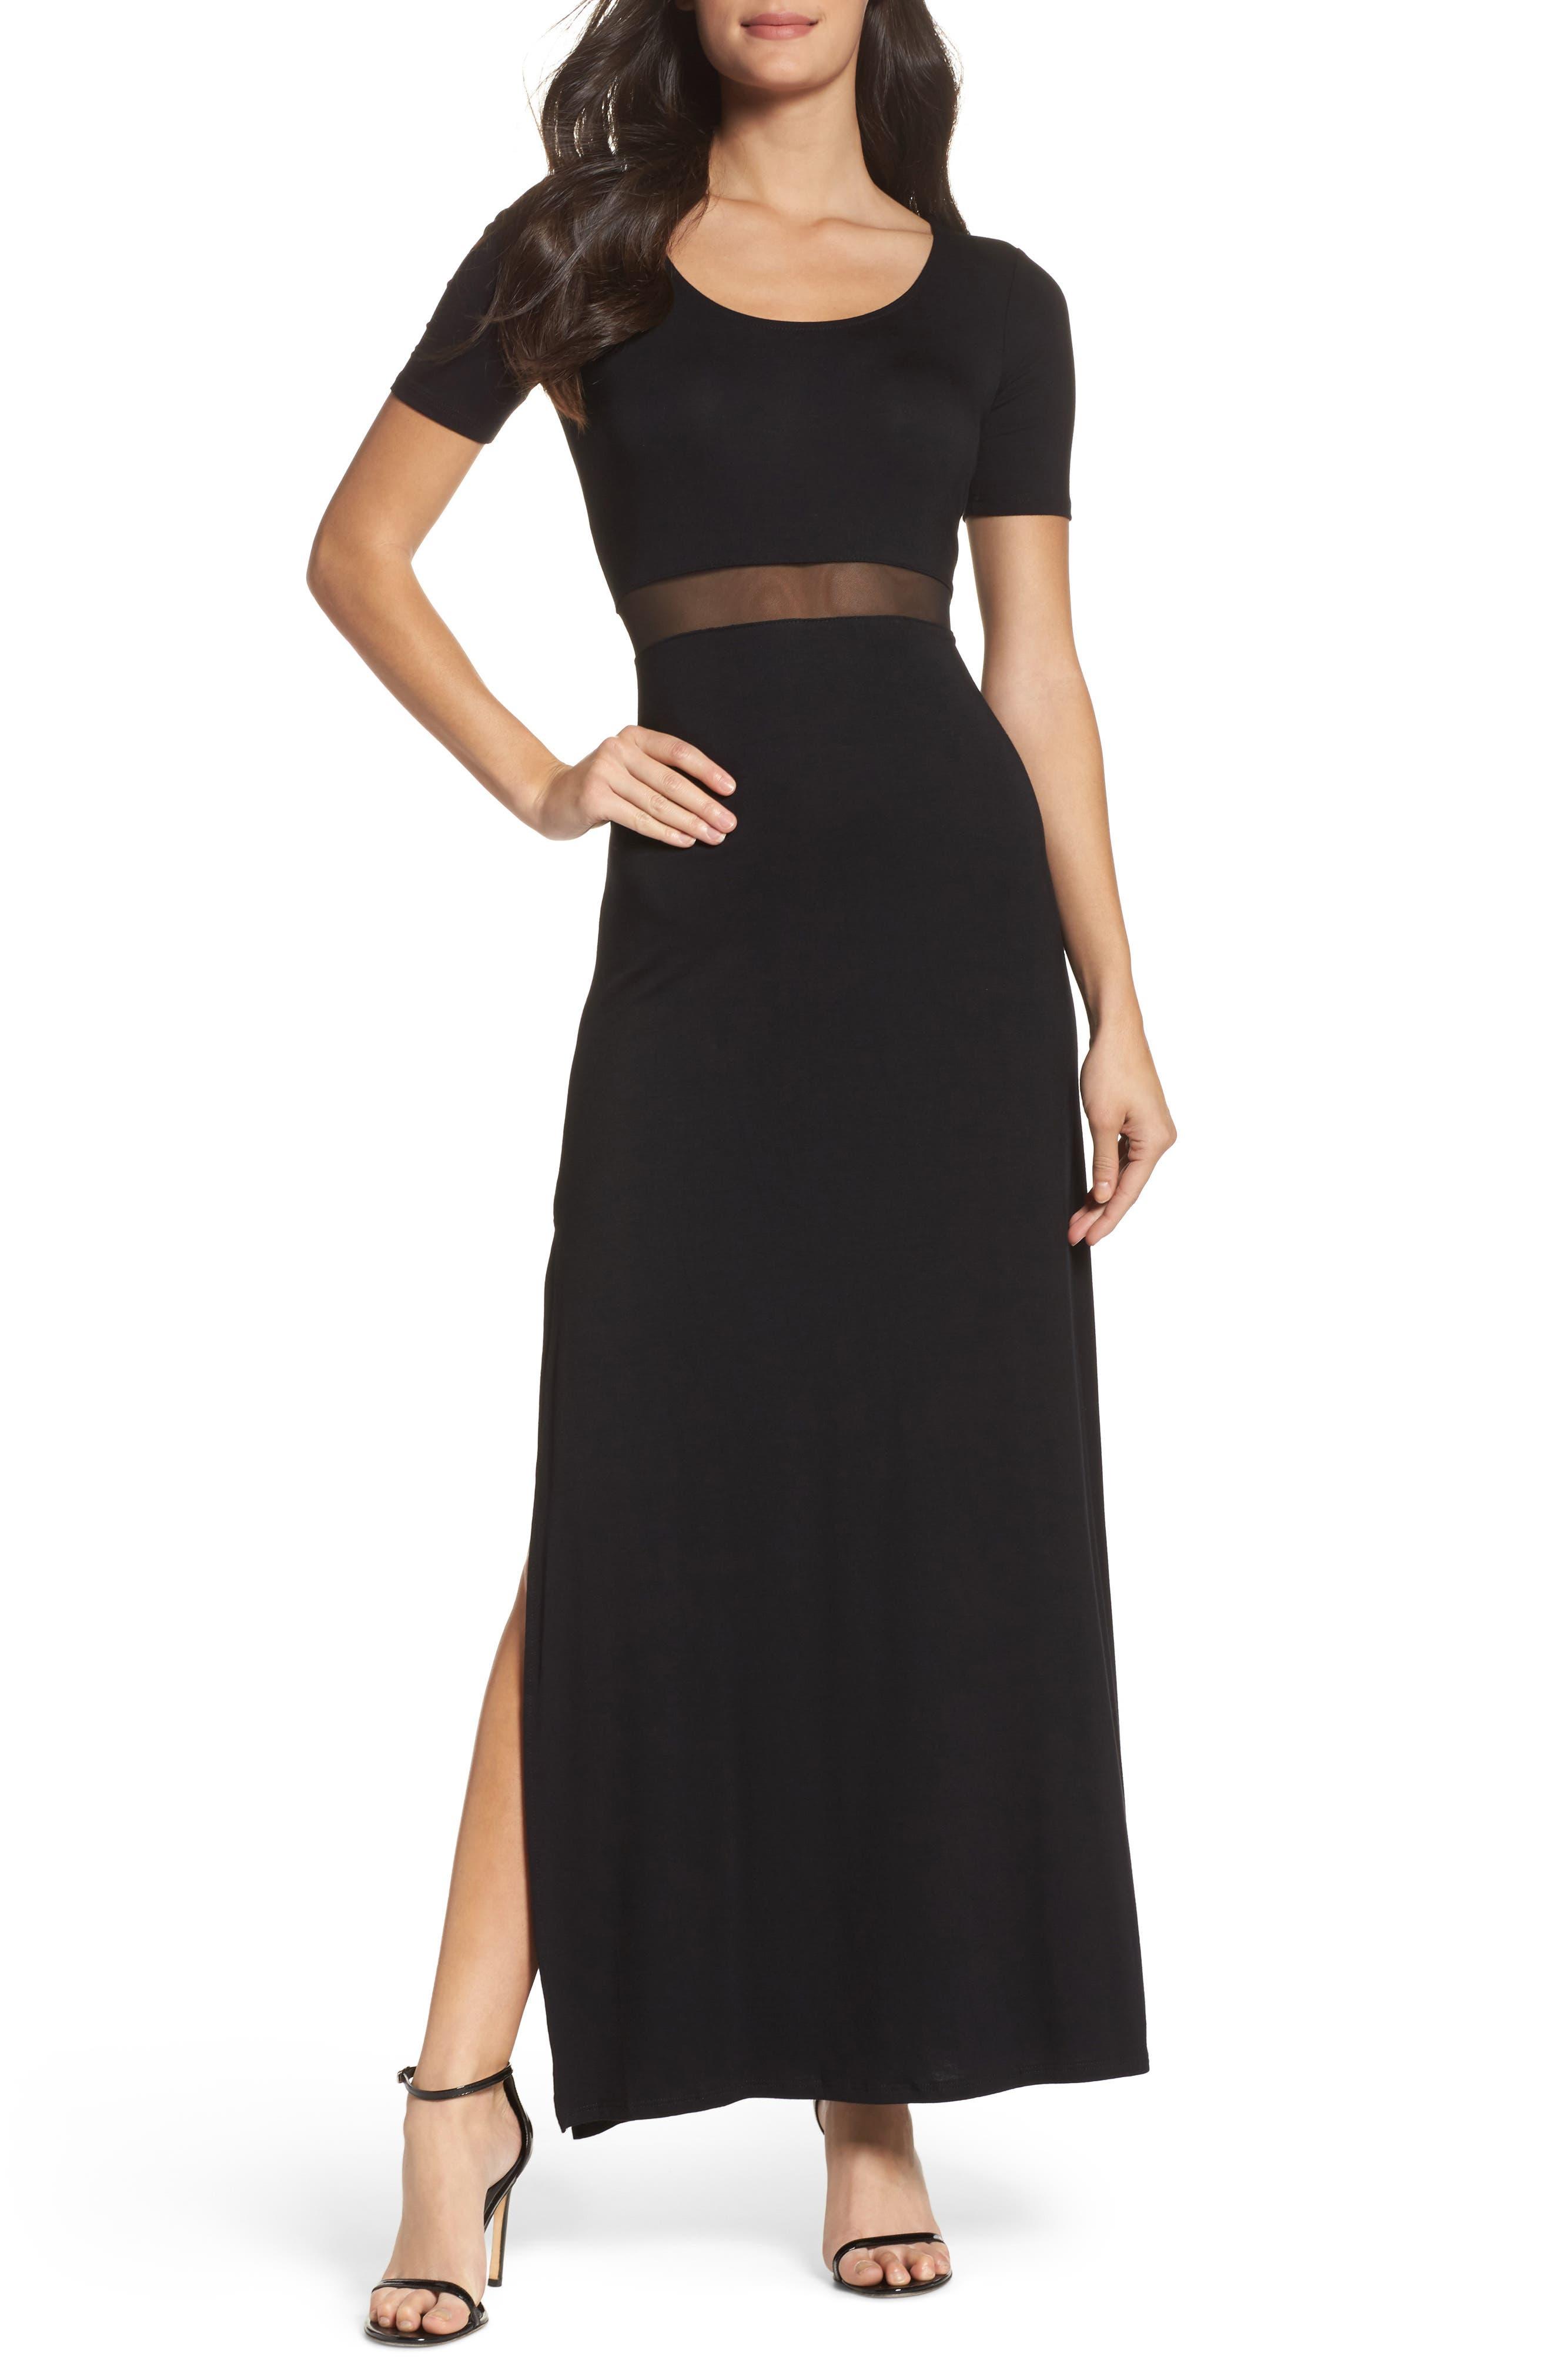 Alternate Image 1 Selected - Lulus Mesh Inset Maxi Dress